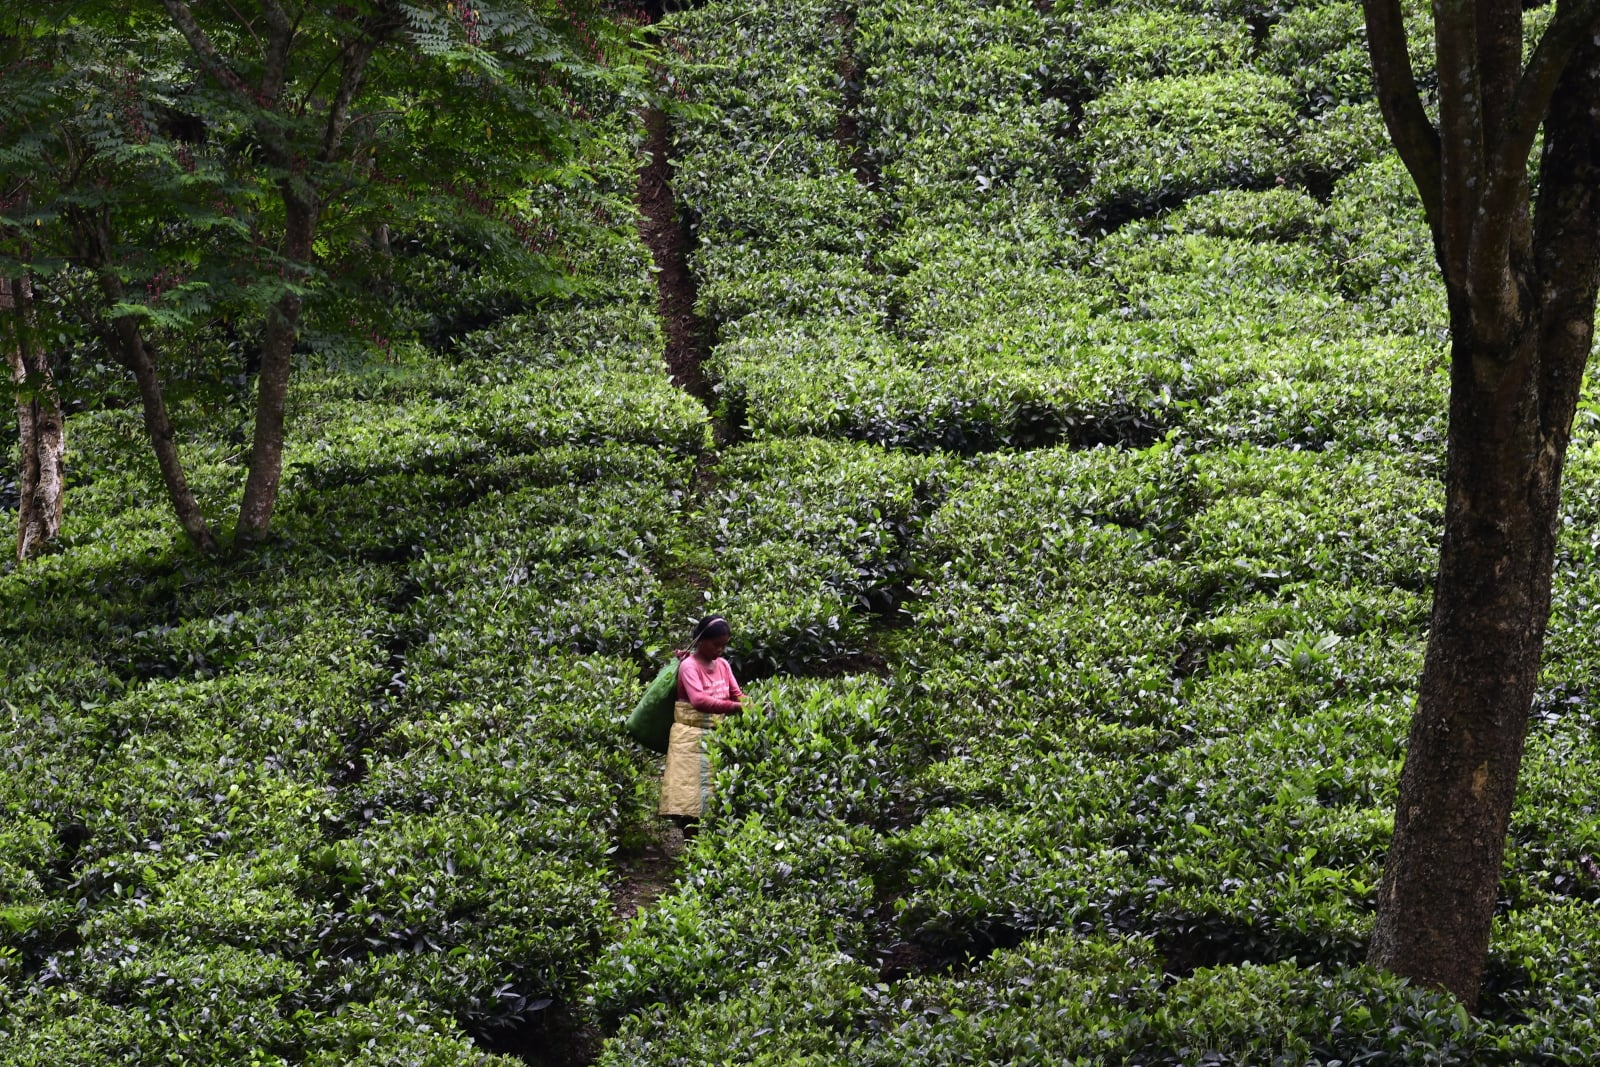 Pola herbaciane w Indiach fot. EPA/STR